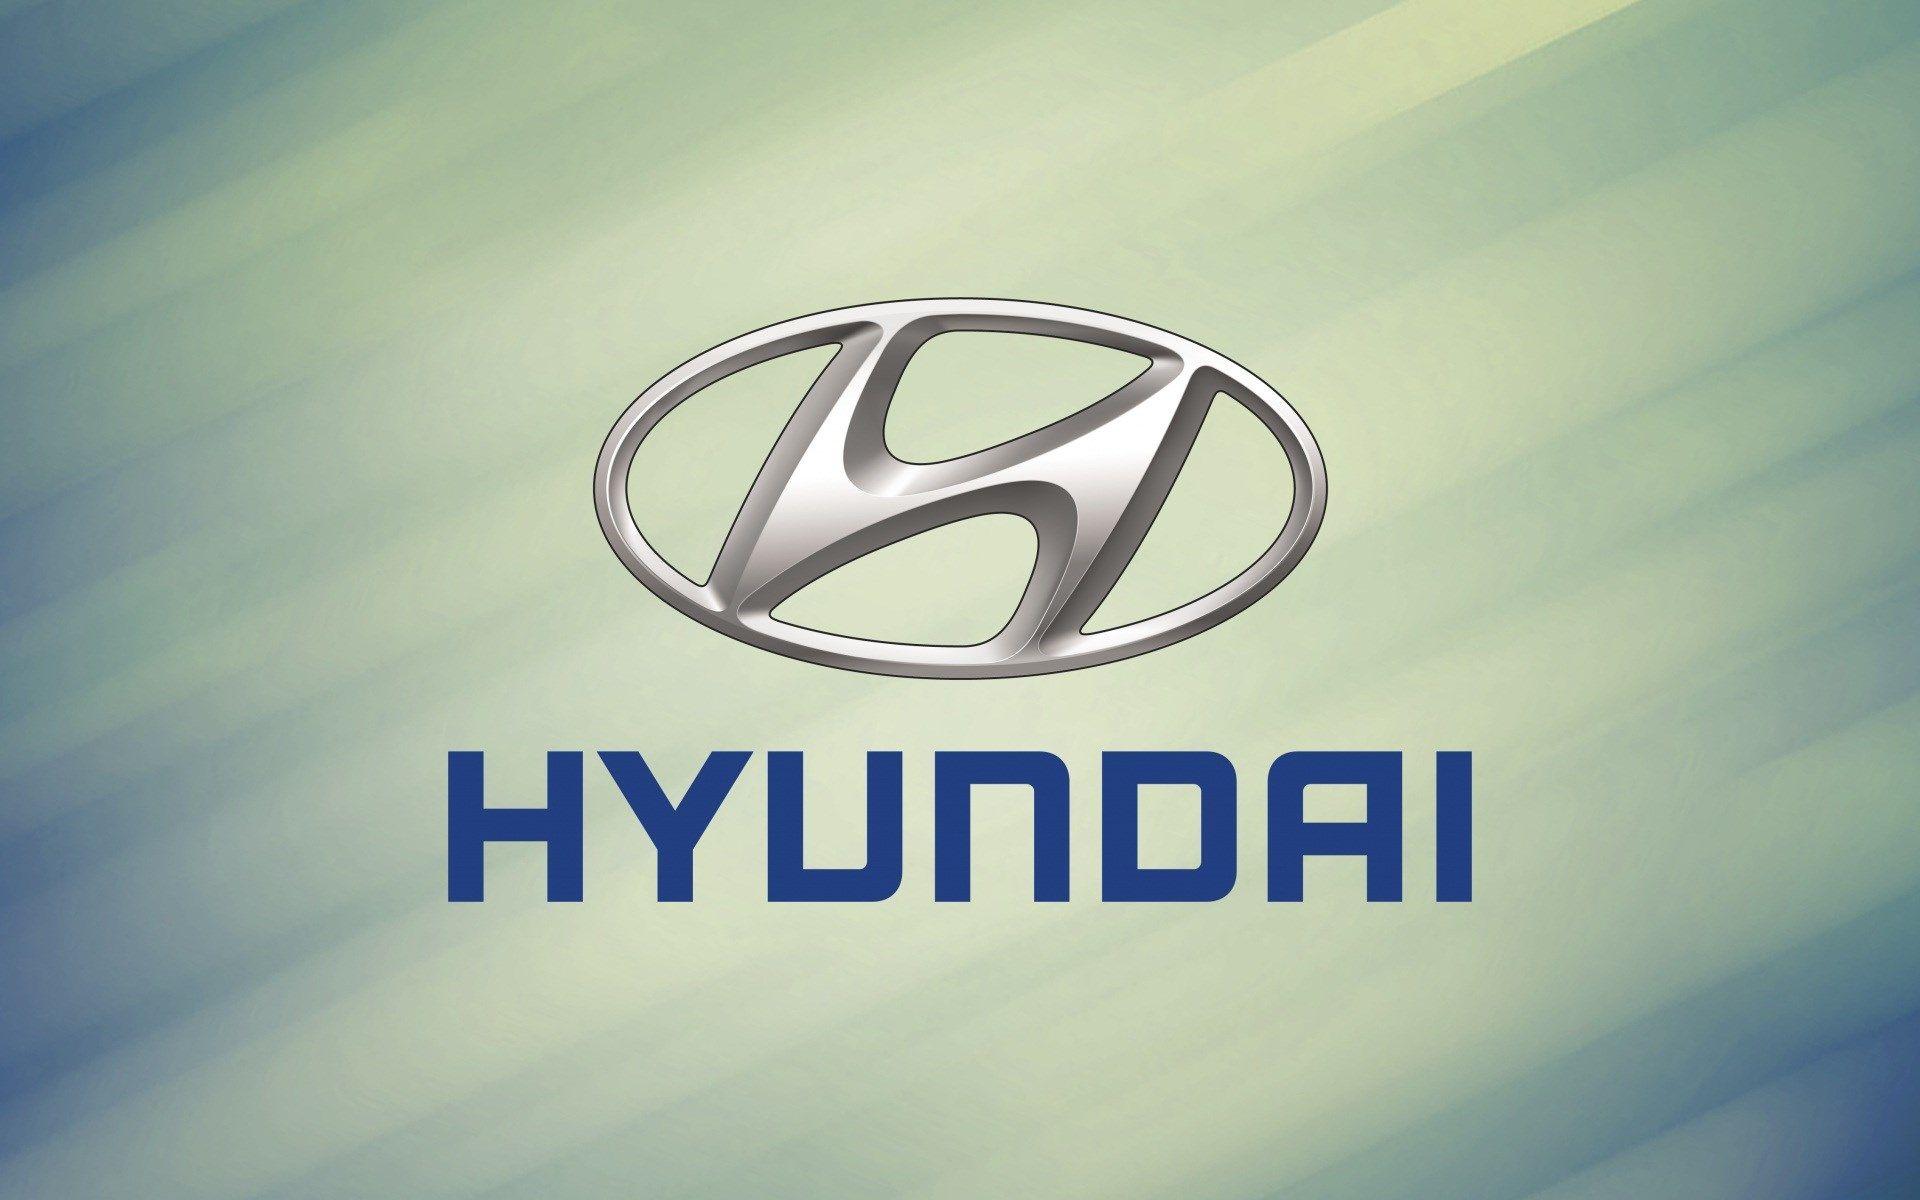 10 Hidden Images In Logos You Never Noticed Hyundai Genesis Kendaraan Gambar